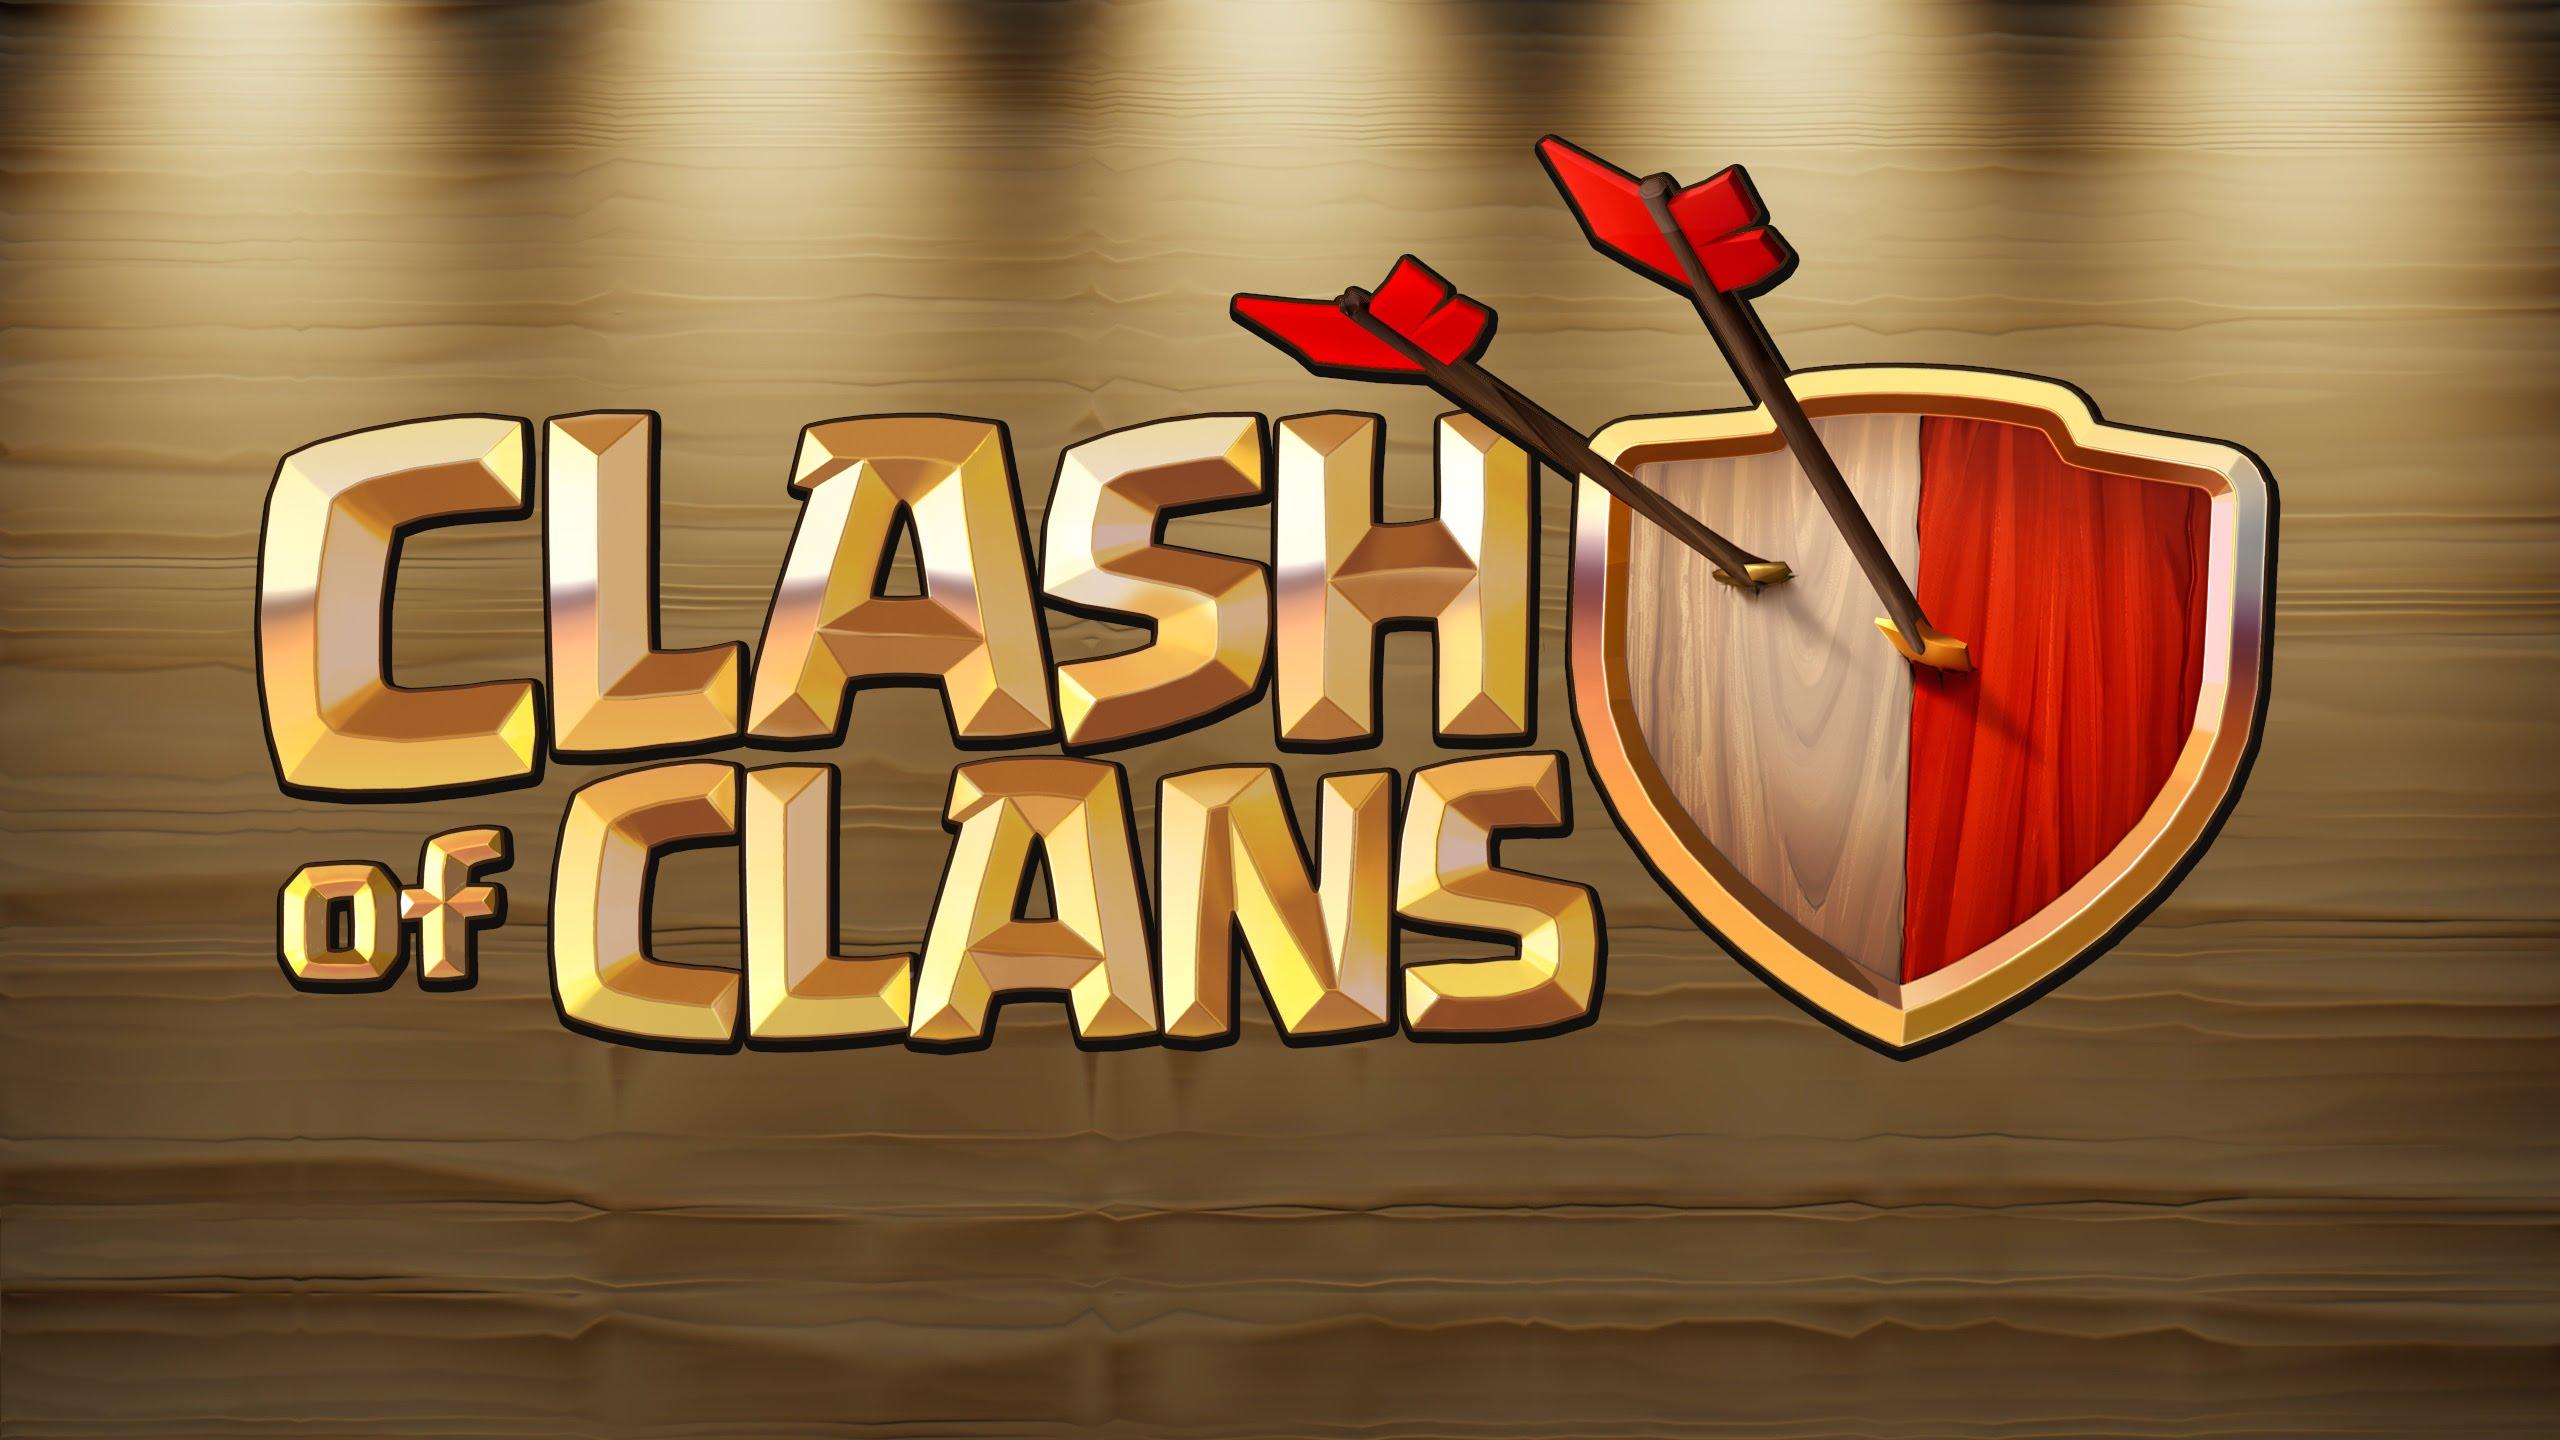 Clash Of Clans Logos